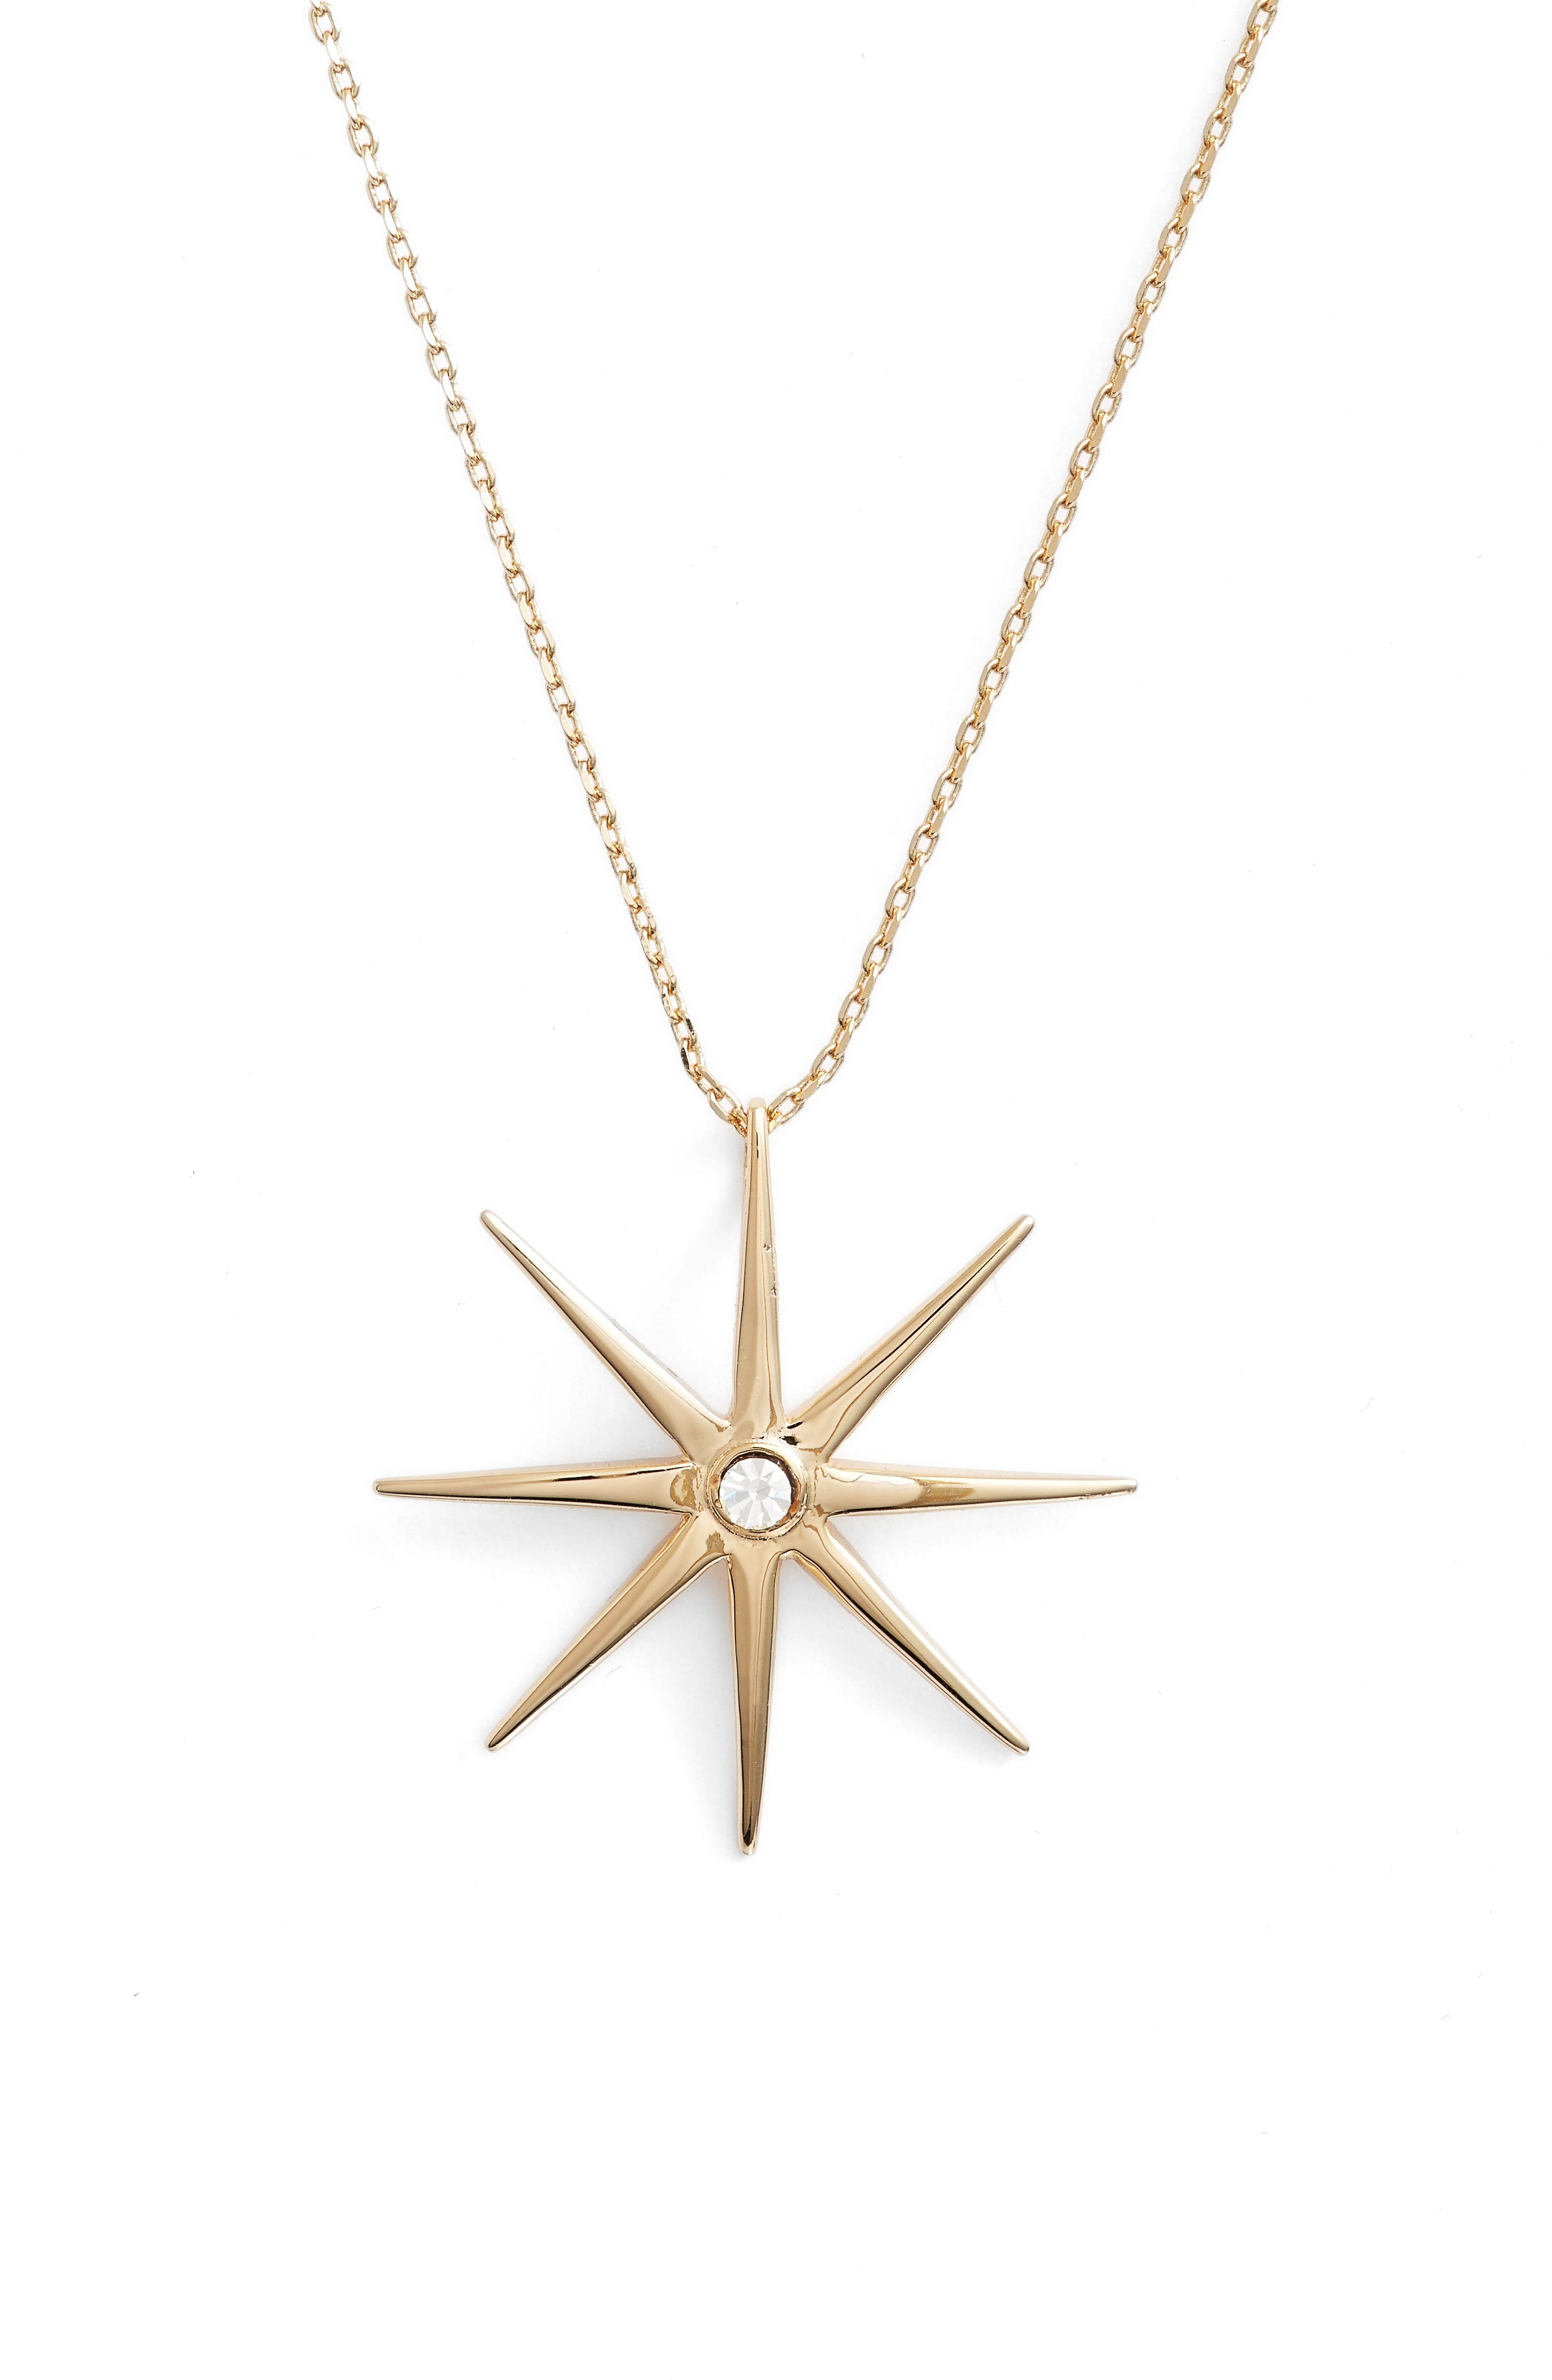 Jules Smith Supernova Necklace